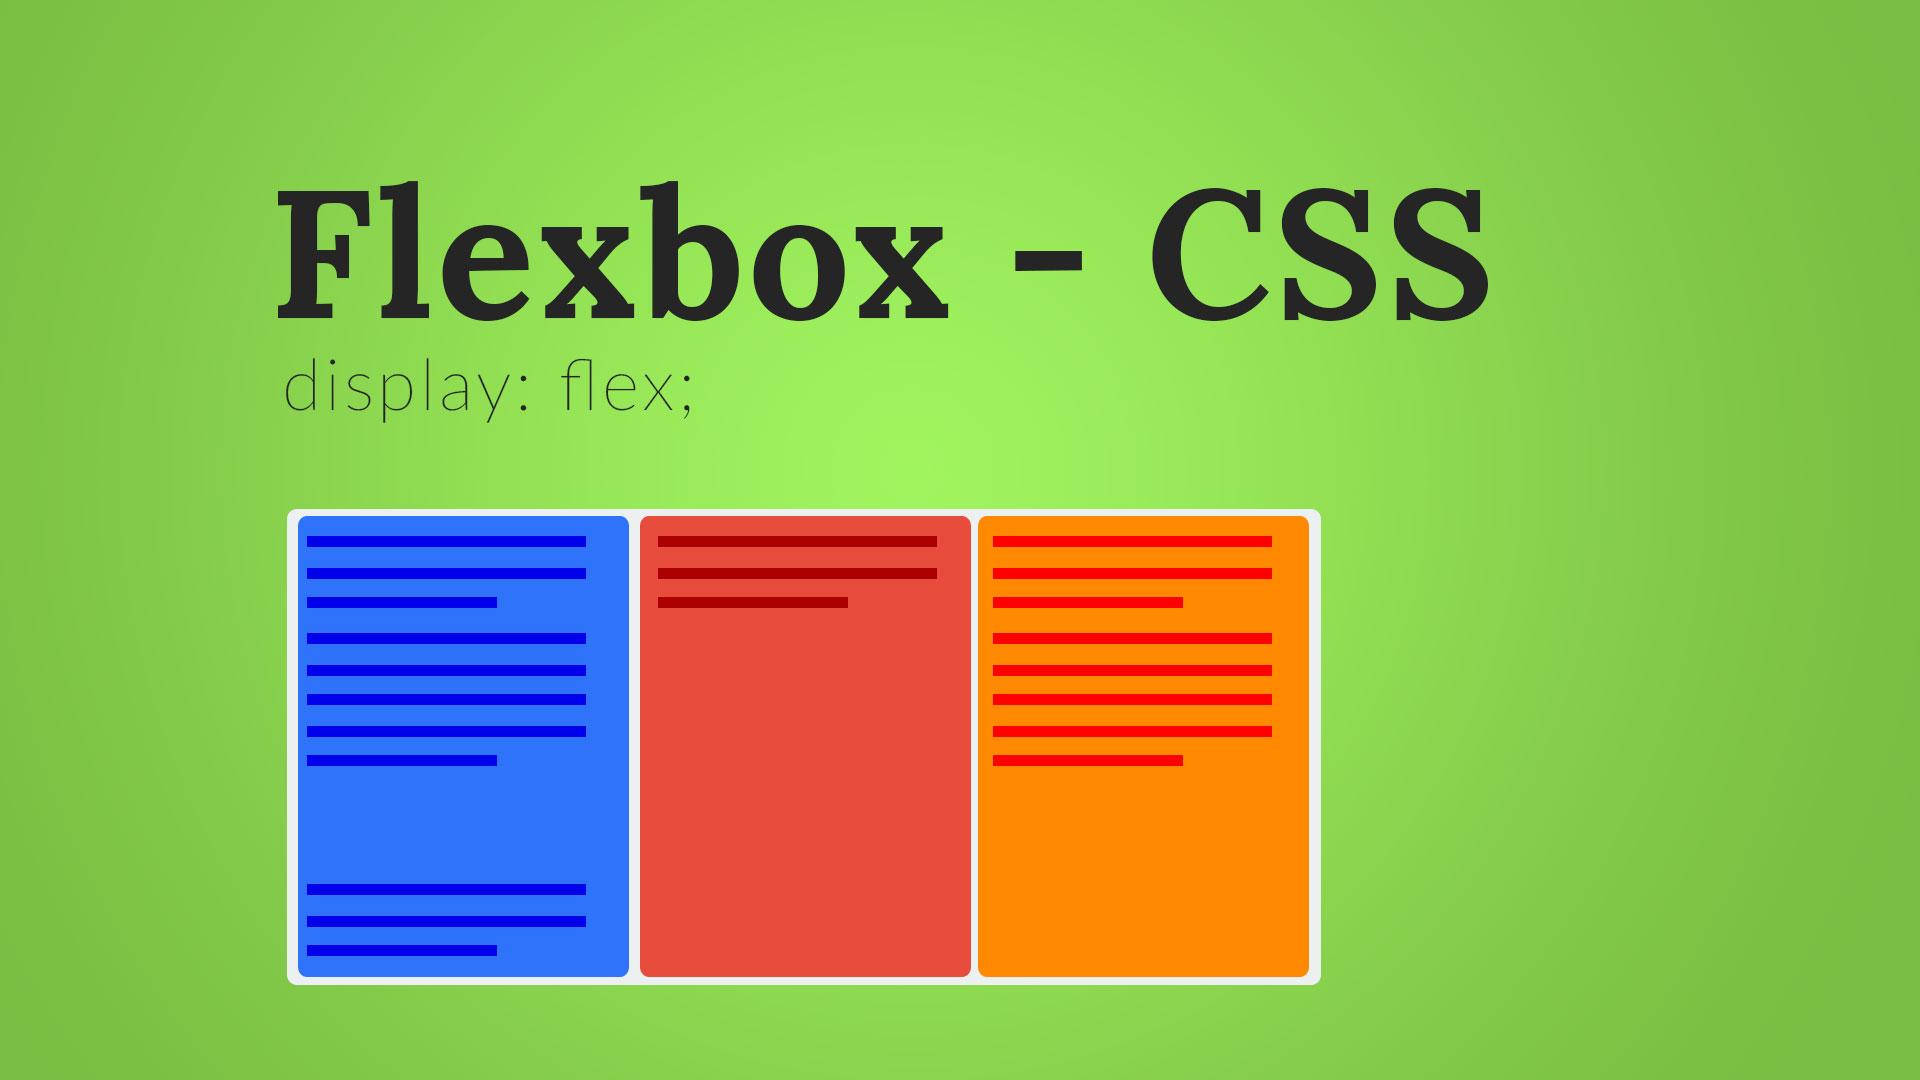 flex1 - Flexbox CSS jako wstęp do Bootstrapa 4